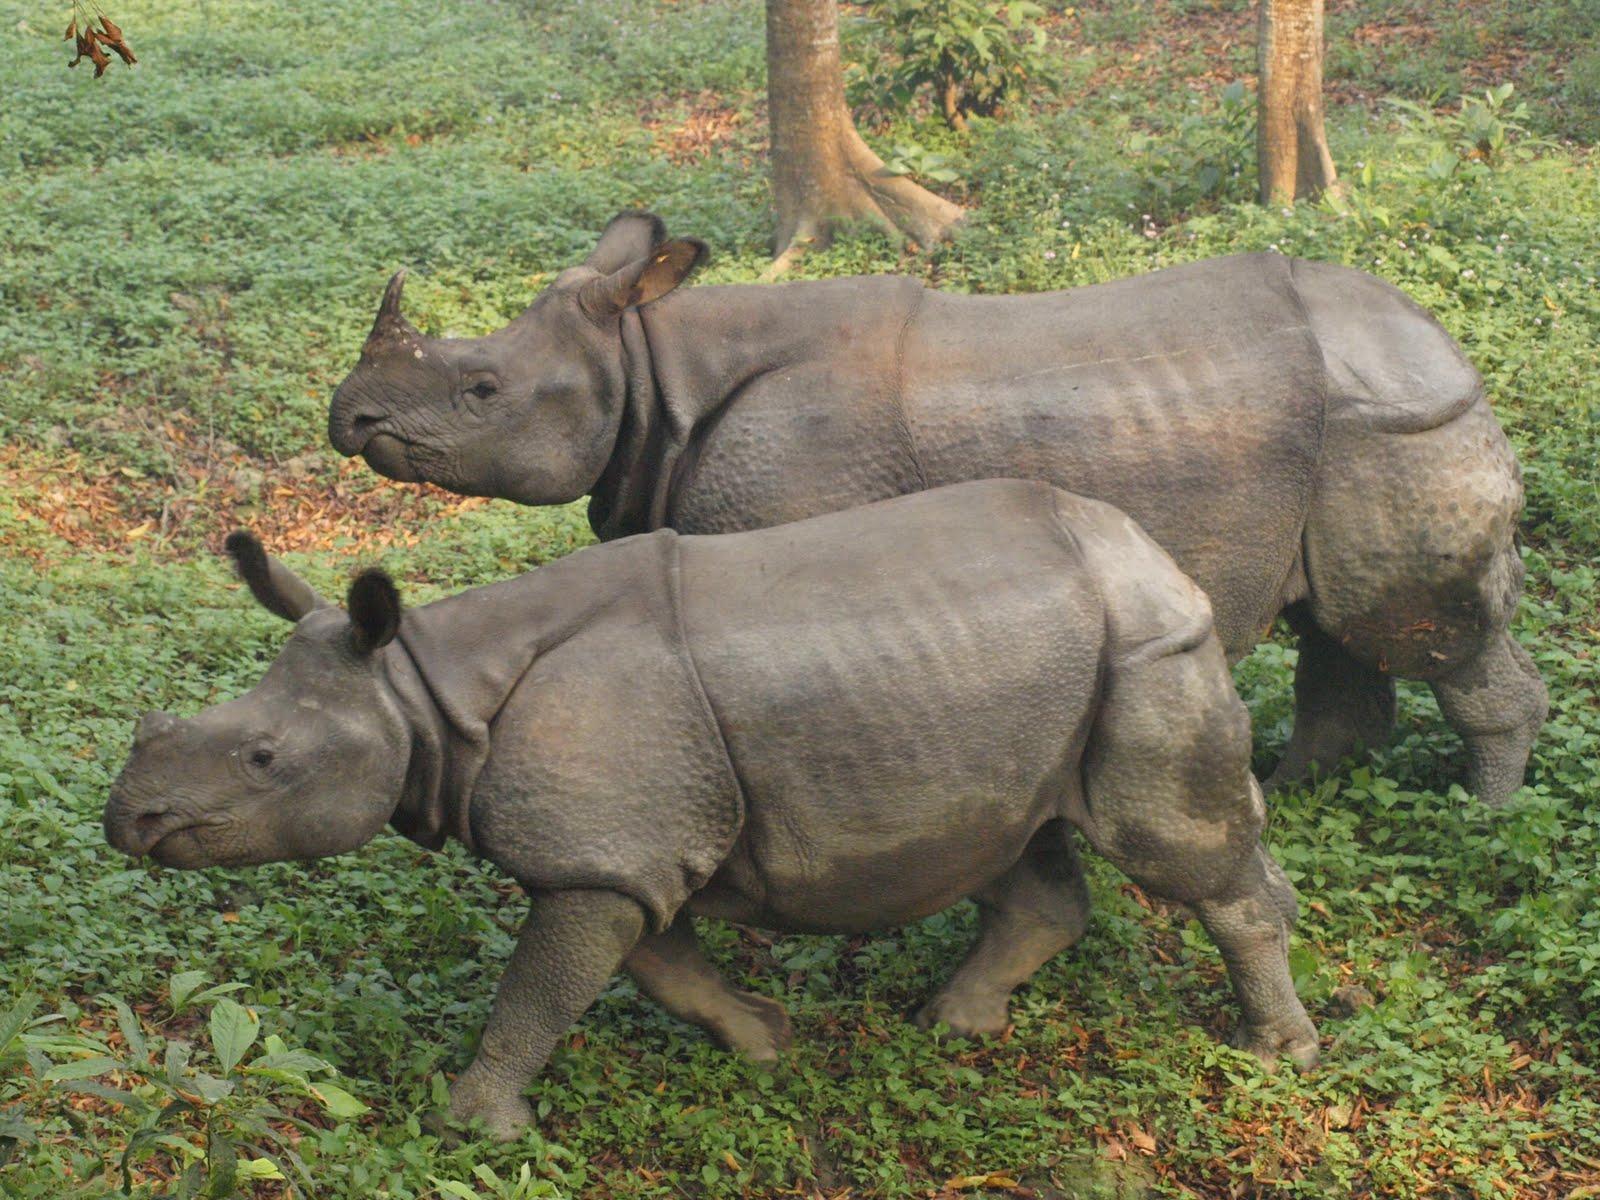 Single horned Rhino. | Flickr - Photo Sharing!